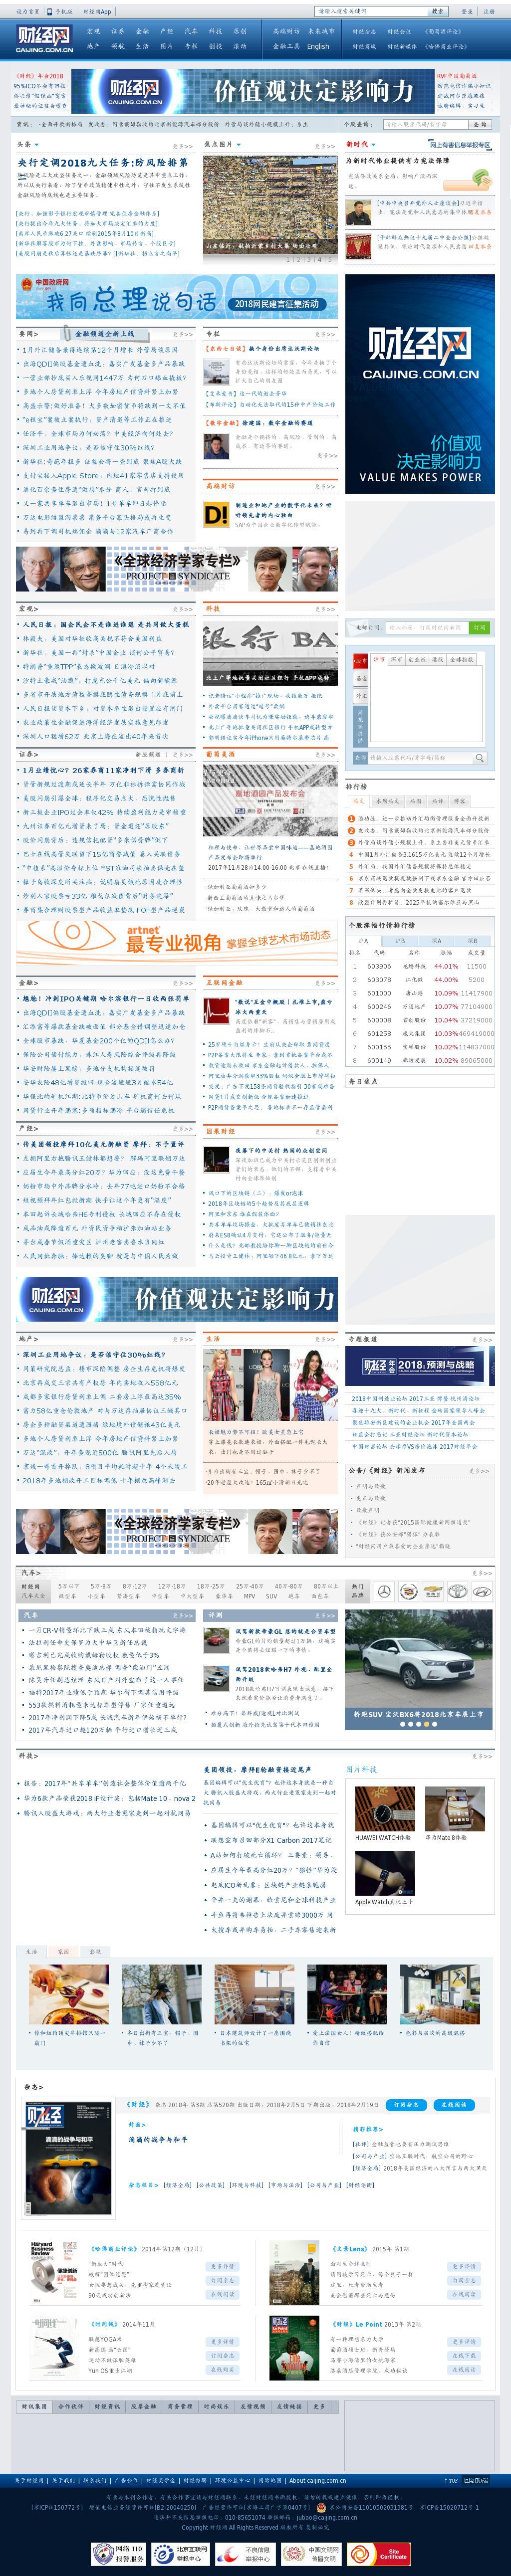 Caijing at Wednesday Feb. 7, 2018, 11:01 a.m. UTC